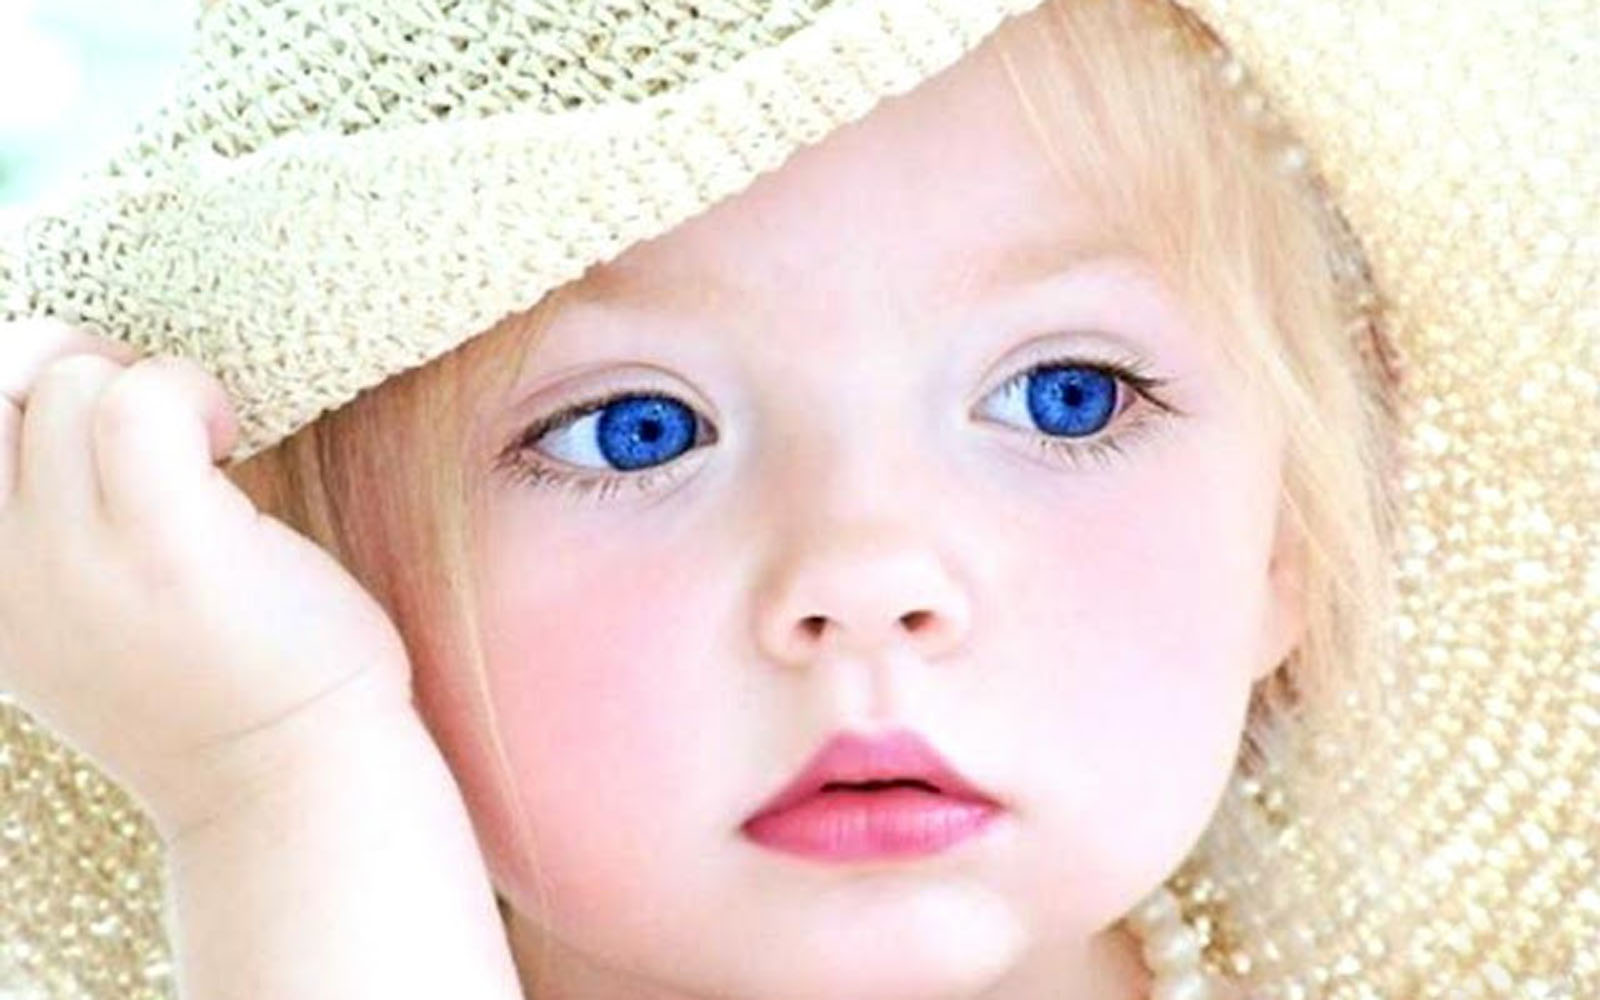 Bouglle Encengkempempret Cute Baby Wallpaper Babies Wallpapers